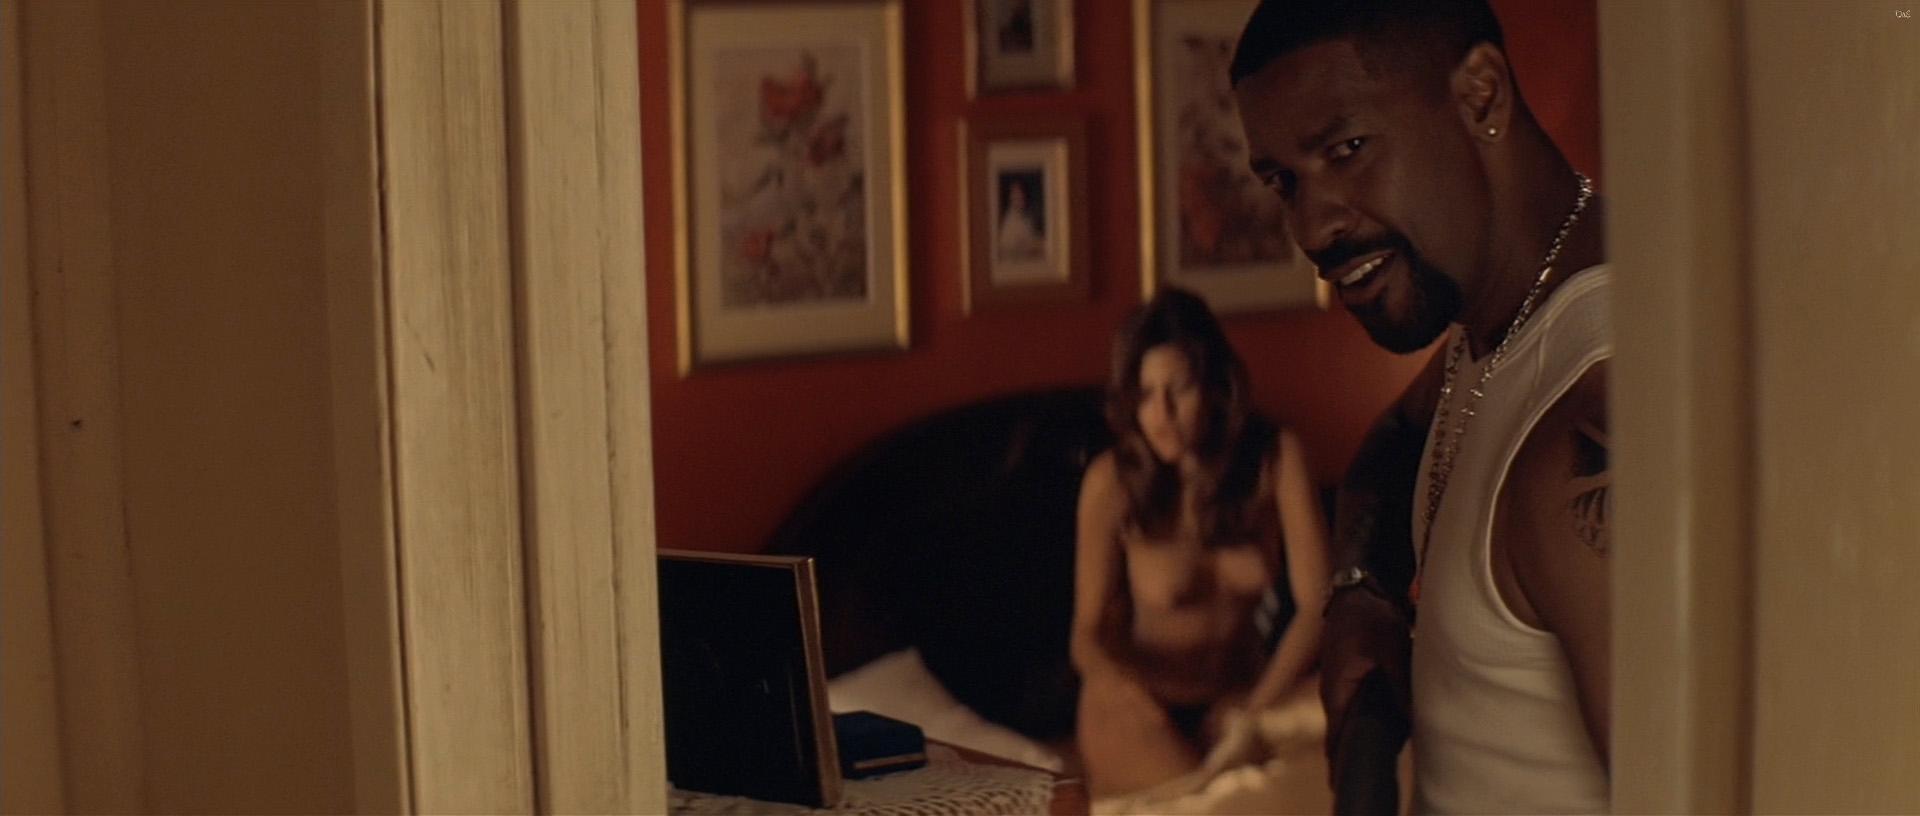 Eva mendes needs a stiff one to get through hot nude sex scene